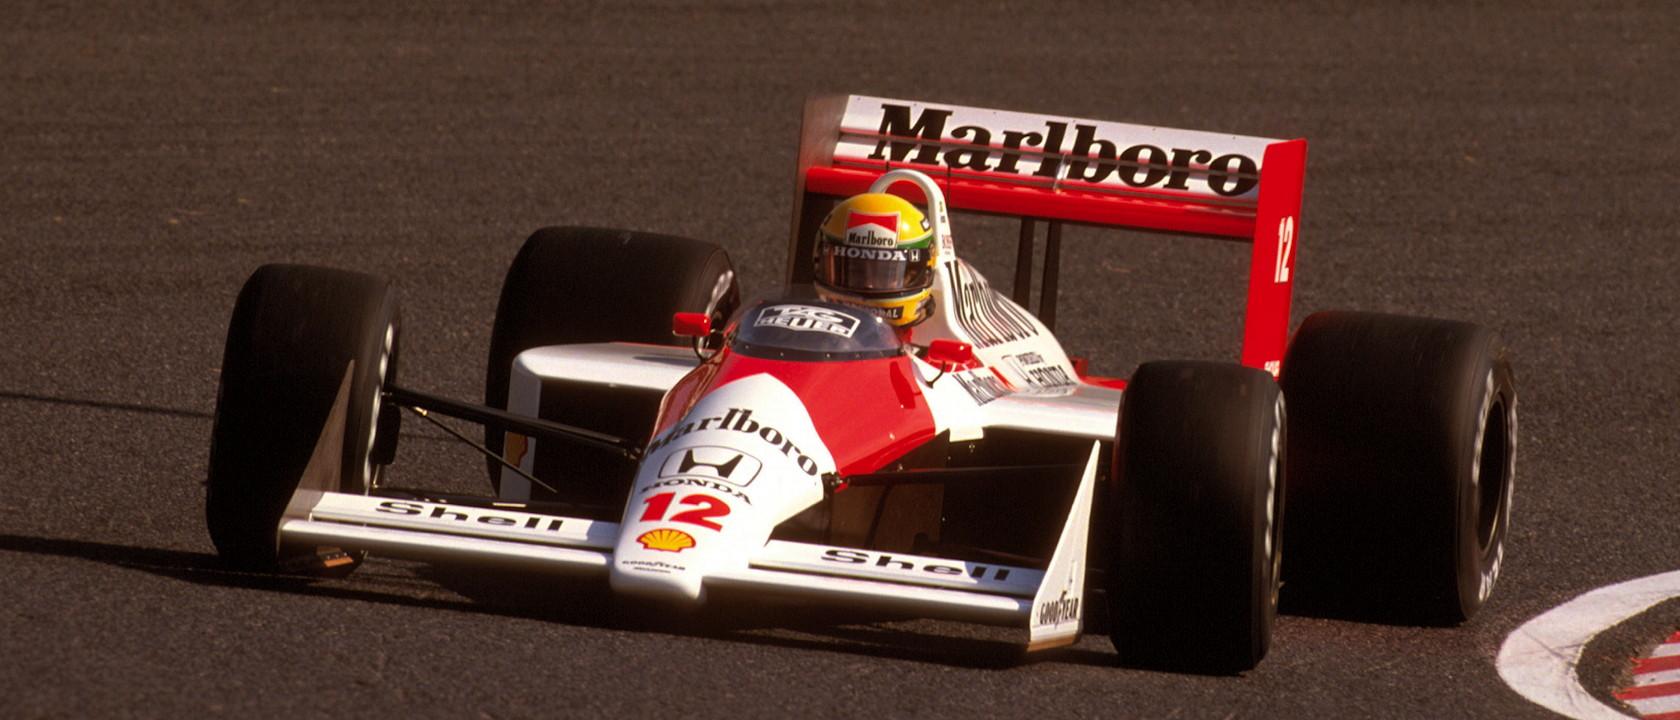 1988 Japanese Grand Prix.